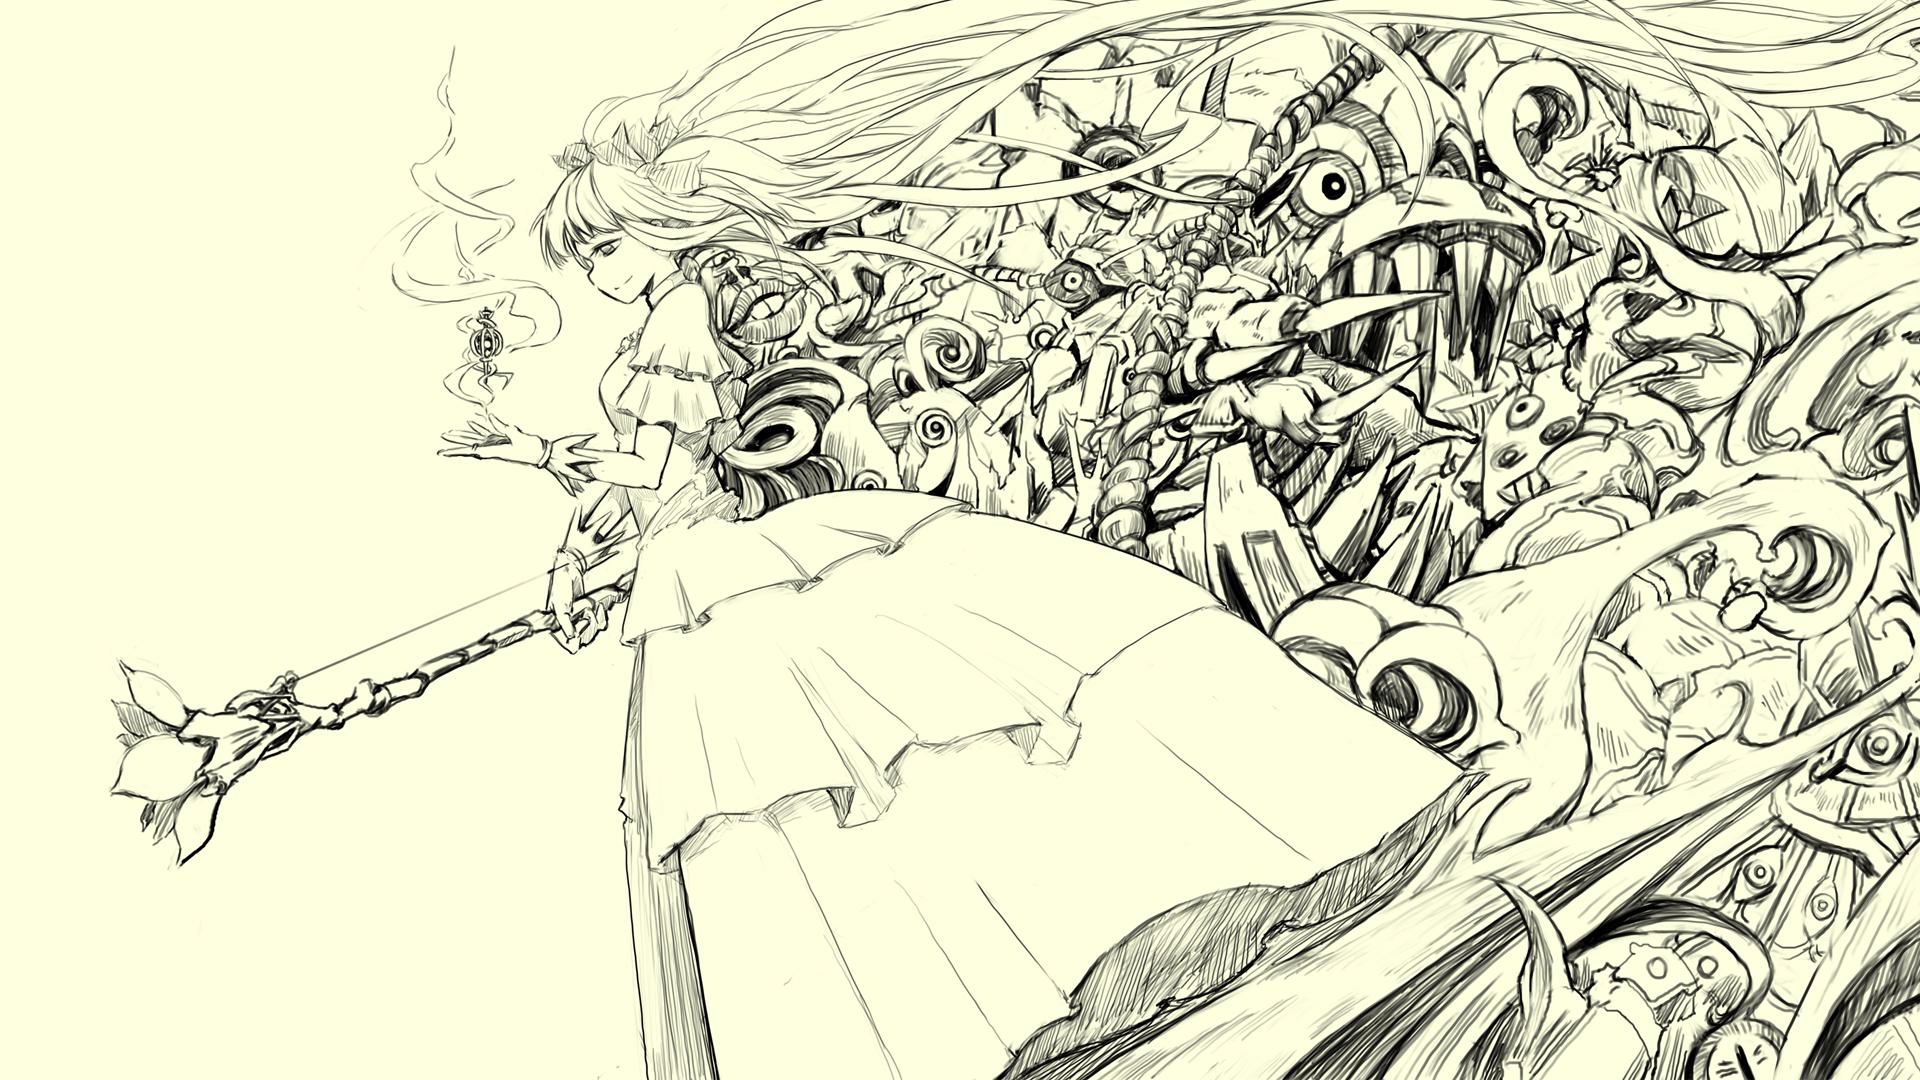 Drawn background anime Sketch Sketch Desktop VV Sketch